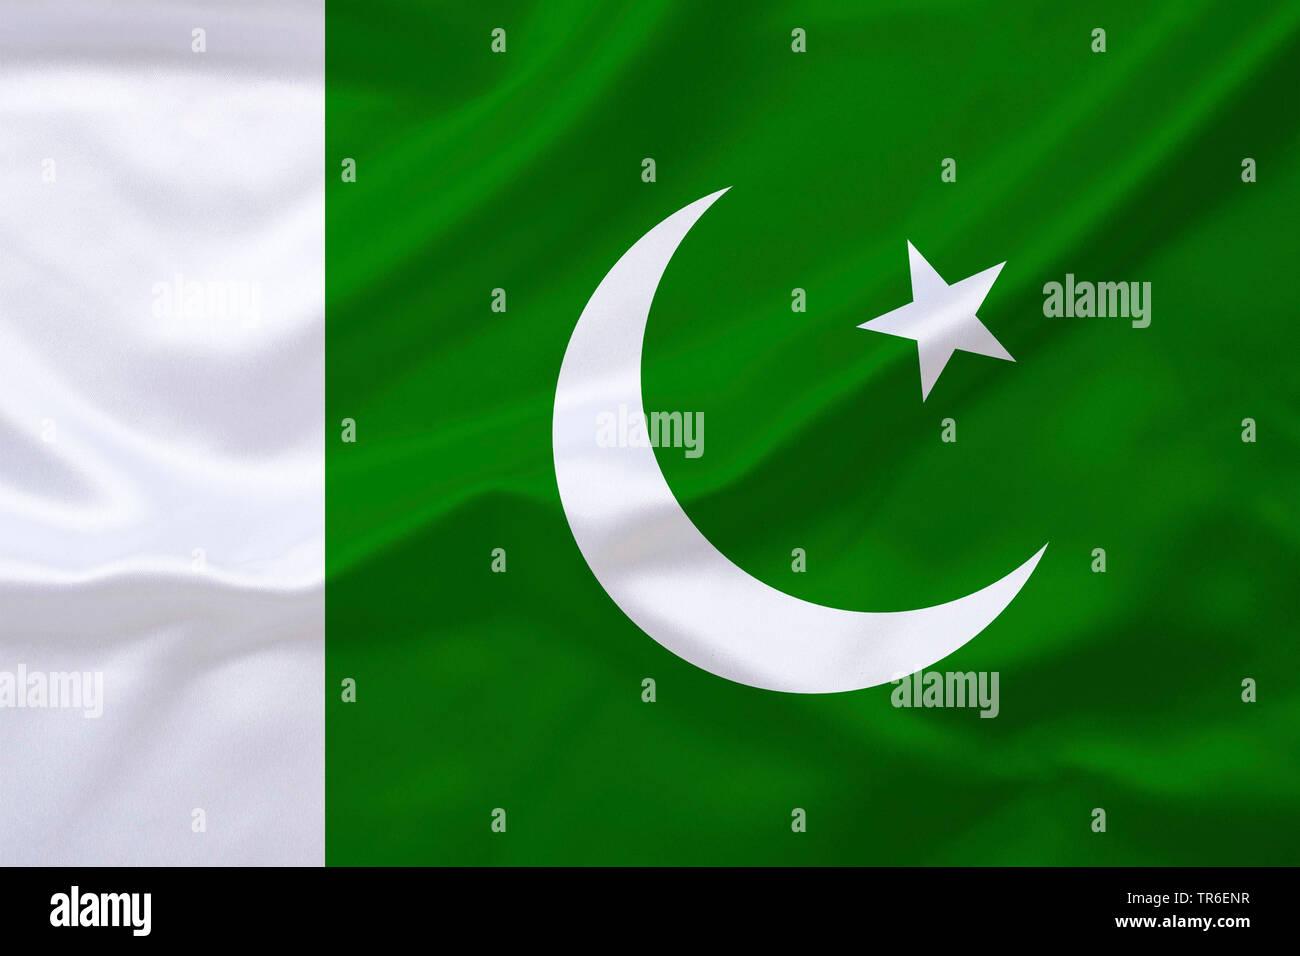 Flagge von Pakistan, Pakistan | flag of Pakistan, Pakistan | BLWS482224.jpg [ (c) blickwinkel/McPHOTO/K. Steinkamp Tel. +49 (0)2302-2793220, E-mail: i - Stock Image